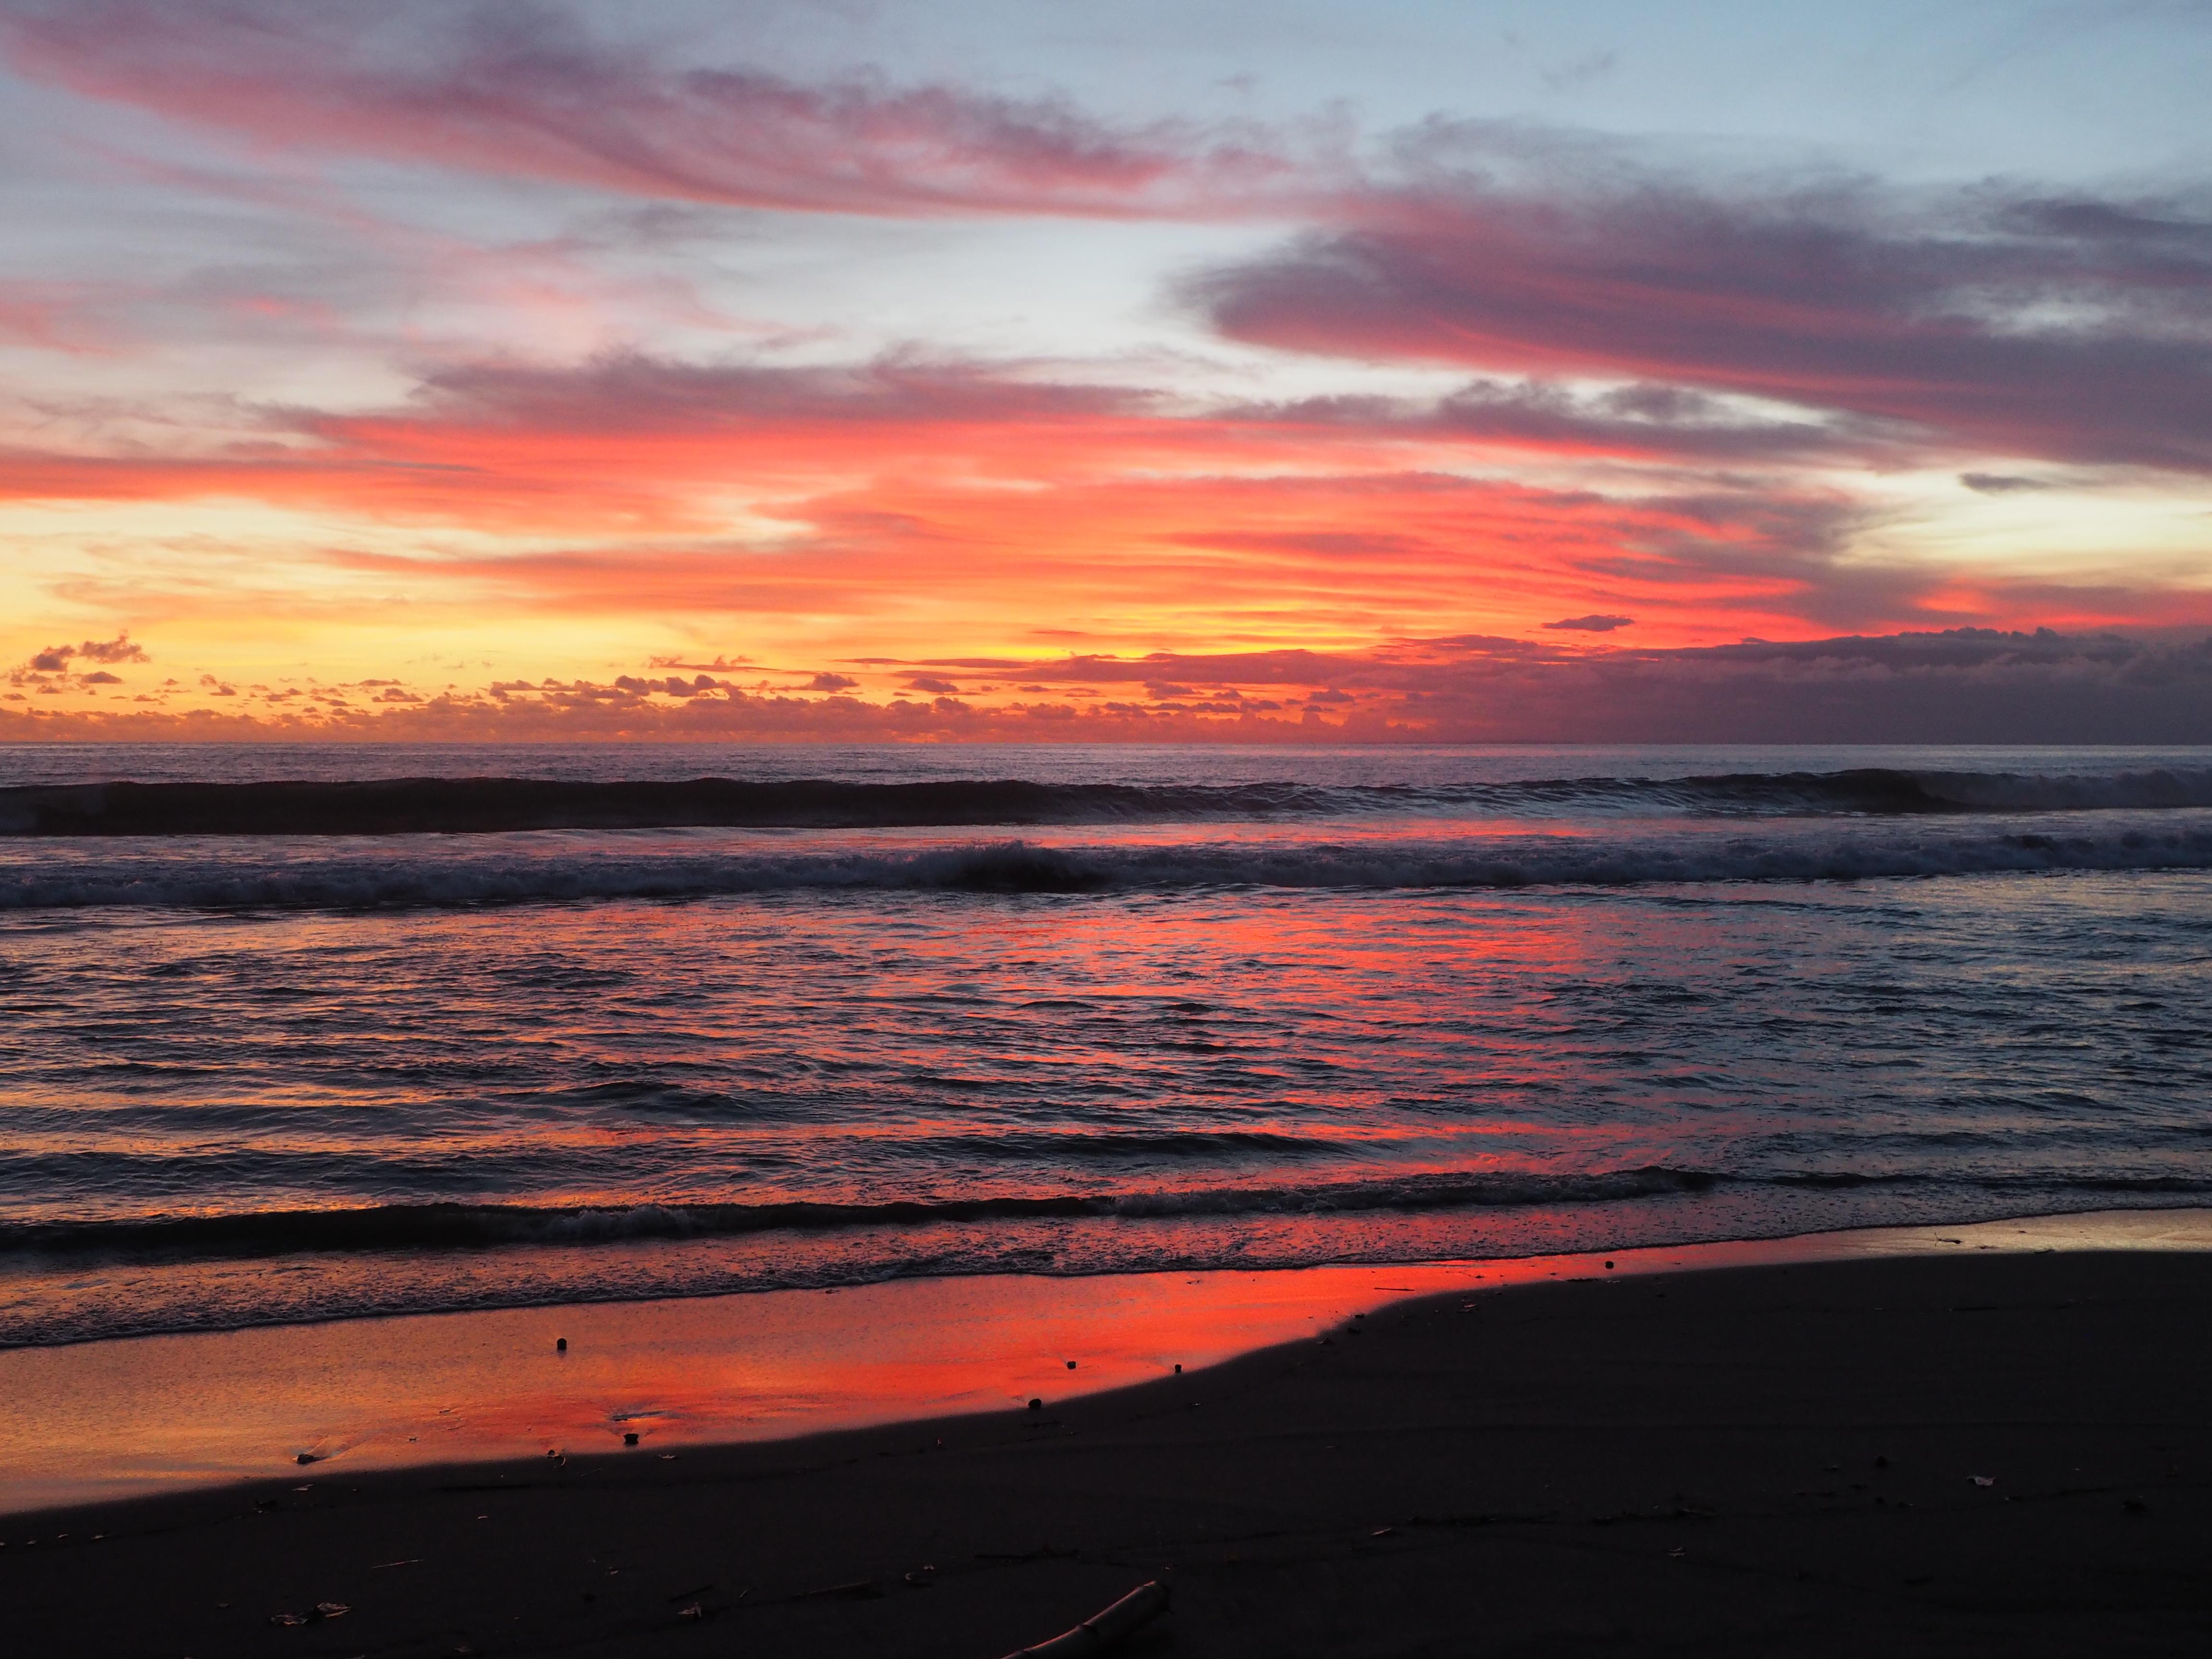 Beach Ocean Sunset Coastline 10